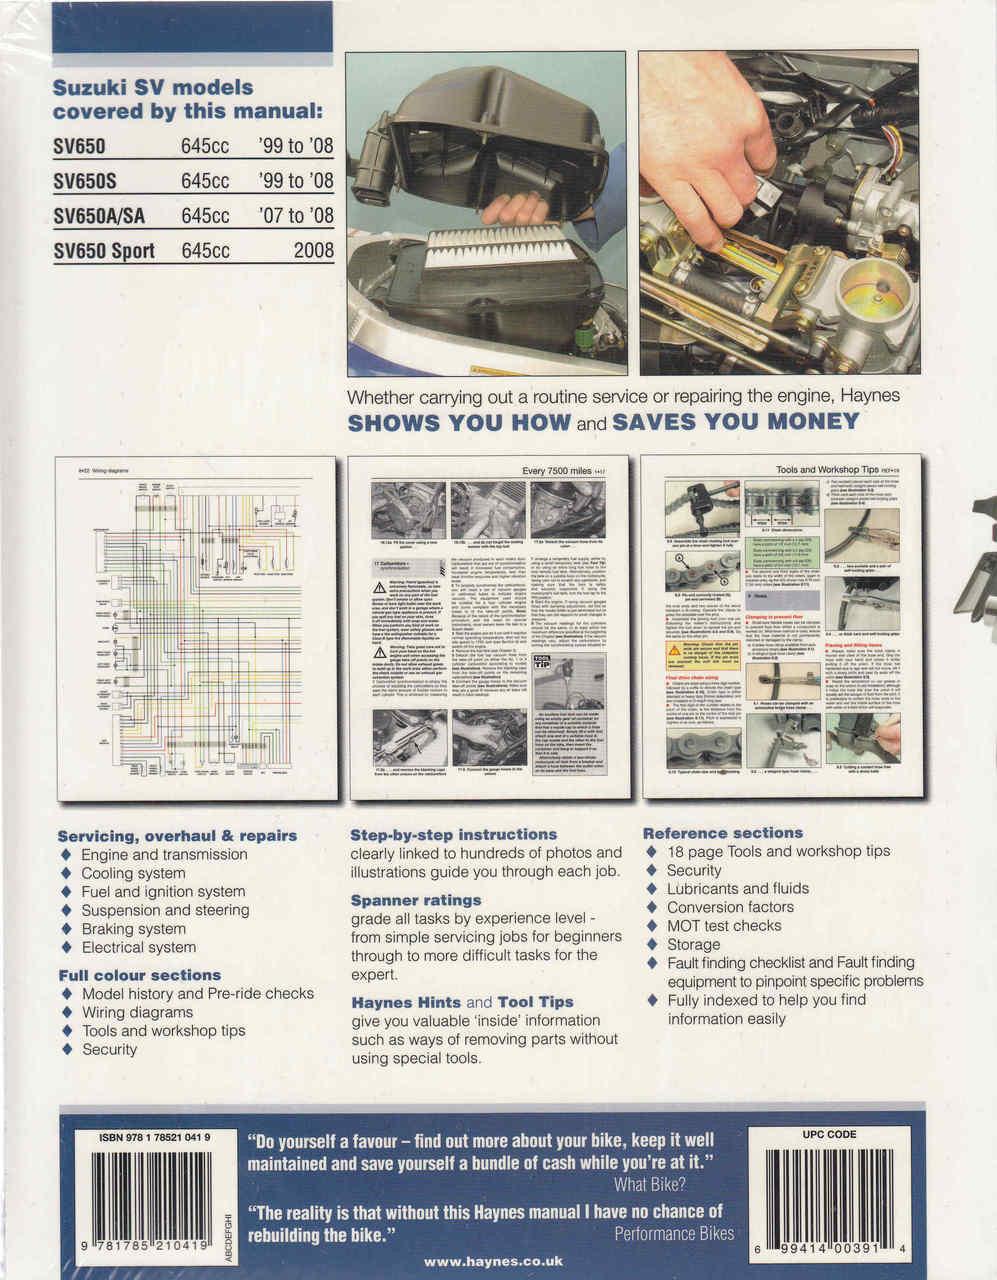 1999 suzuki sv650 wiring diagram | wiring diagram | repair guides on